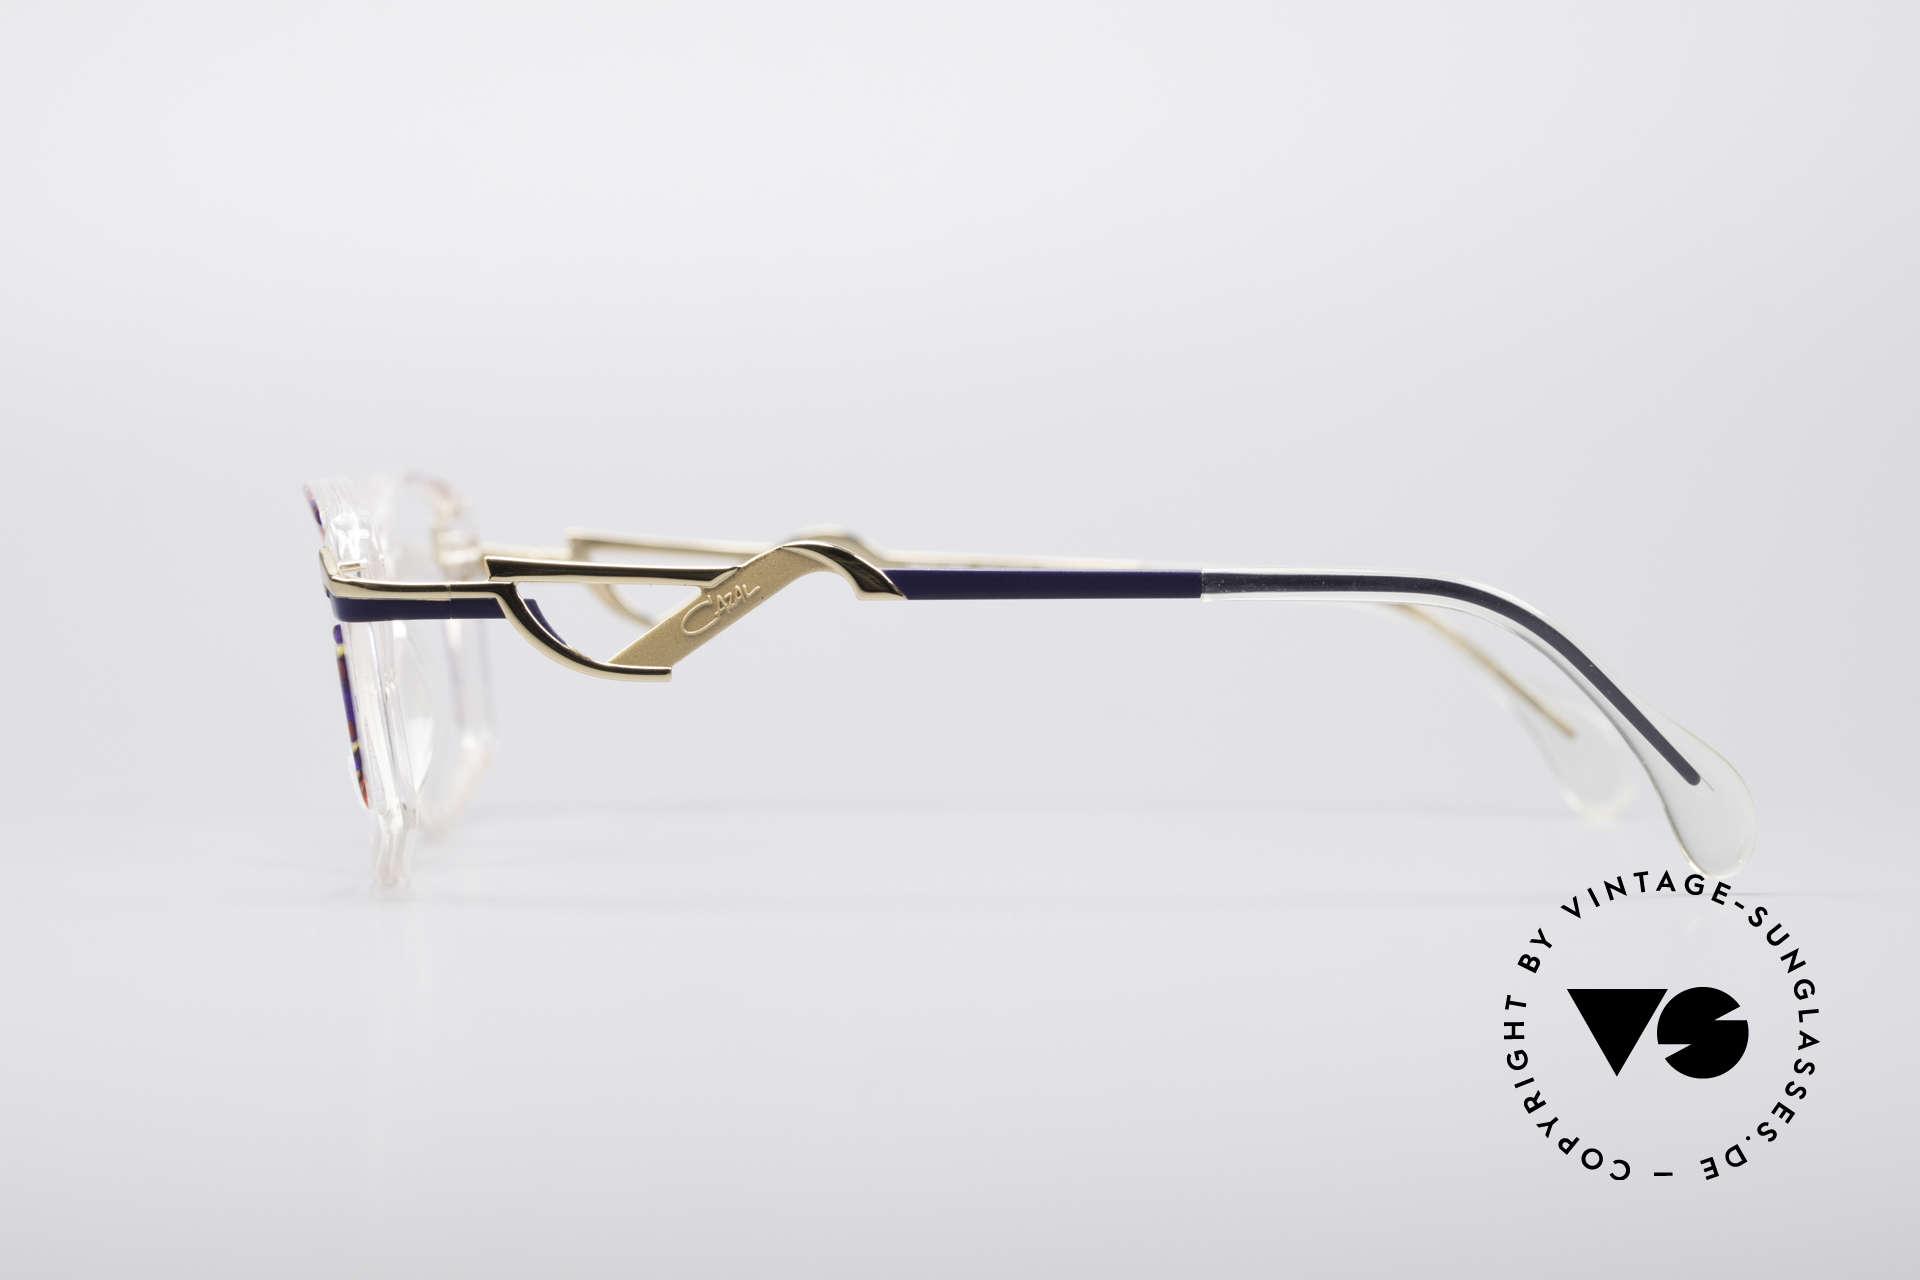 Cazal 369 90's Vintage No Retro Specs, NO RETRO GLASSES, but a fancy old 1990's ORIGINAL!, Made for Women